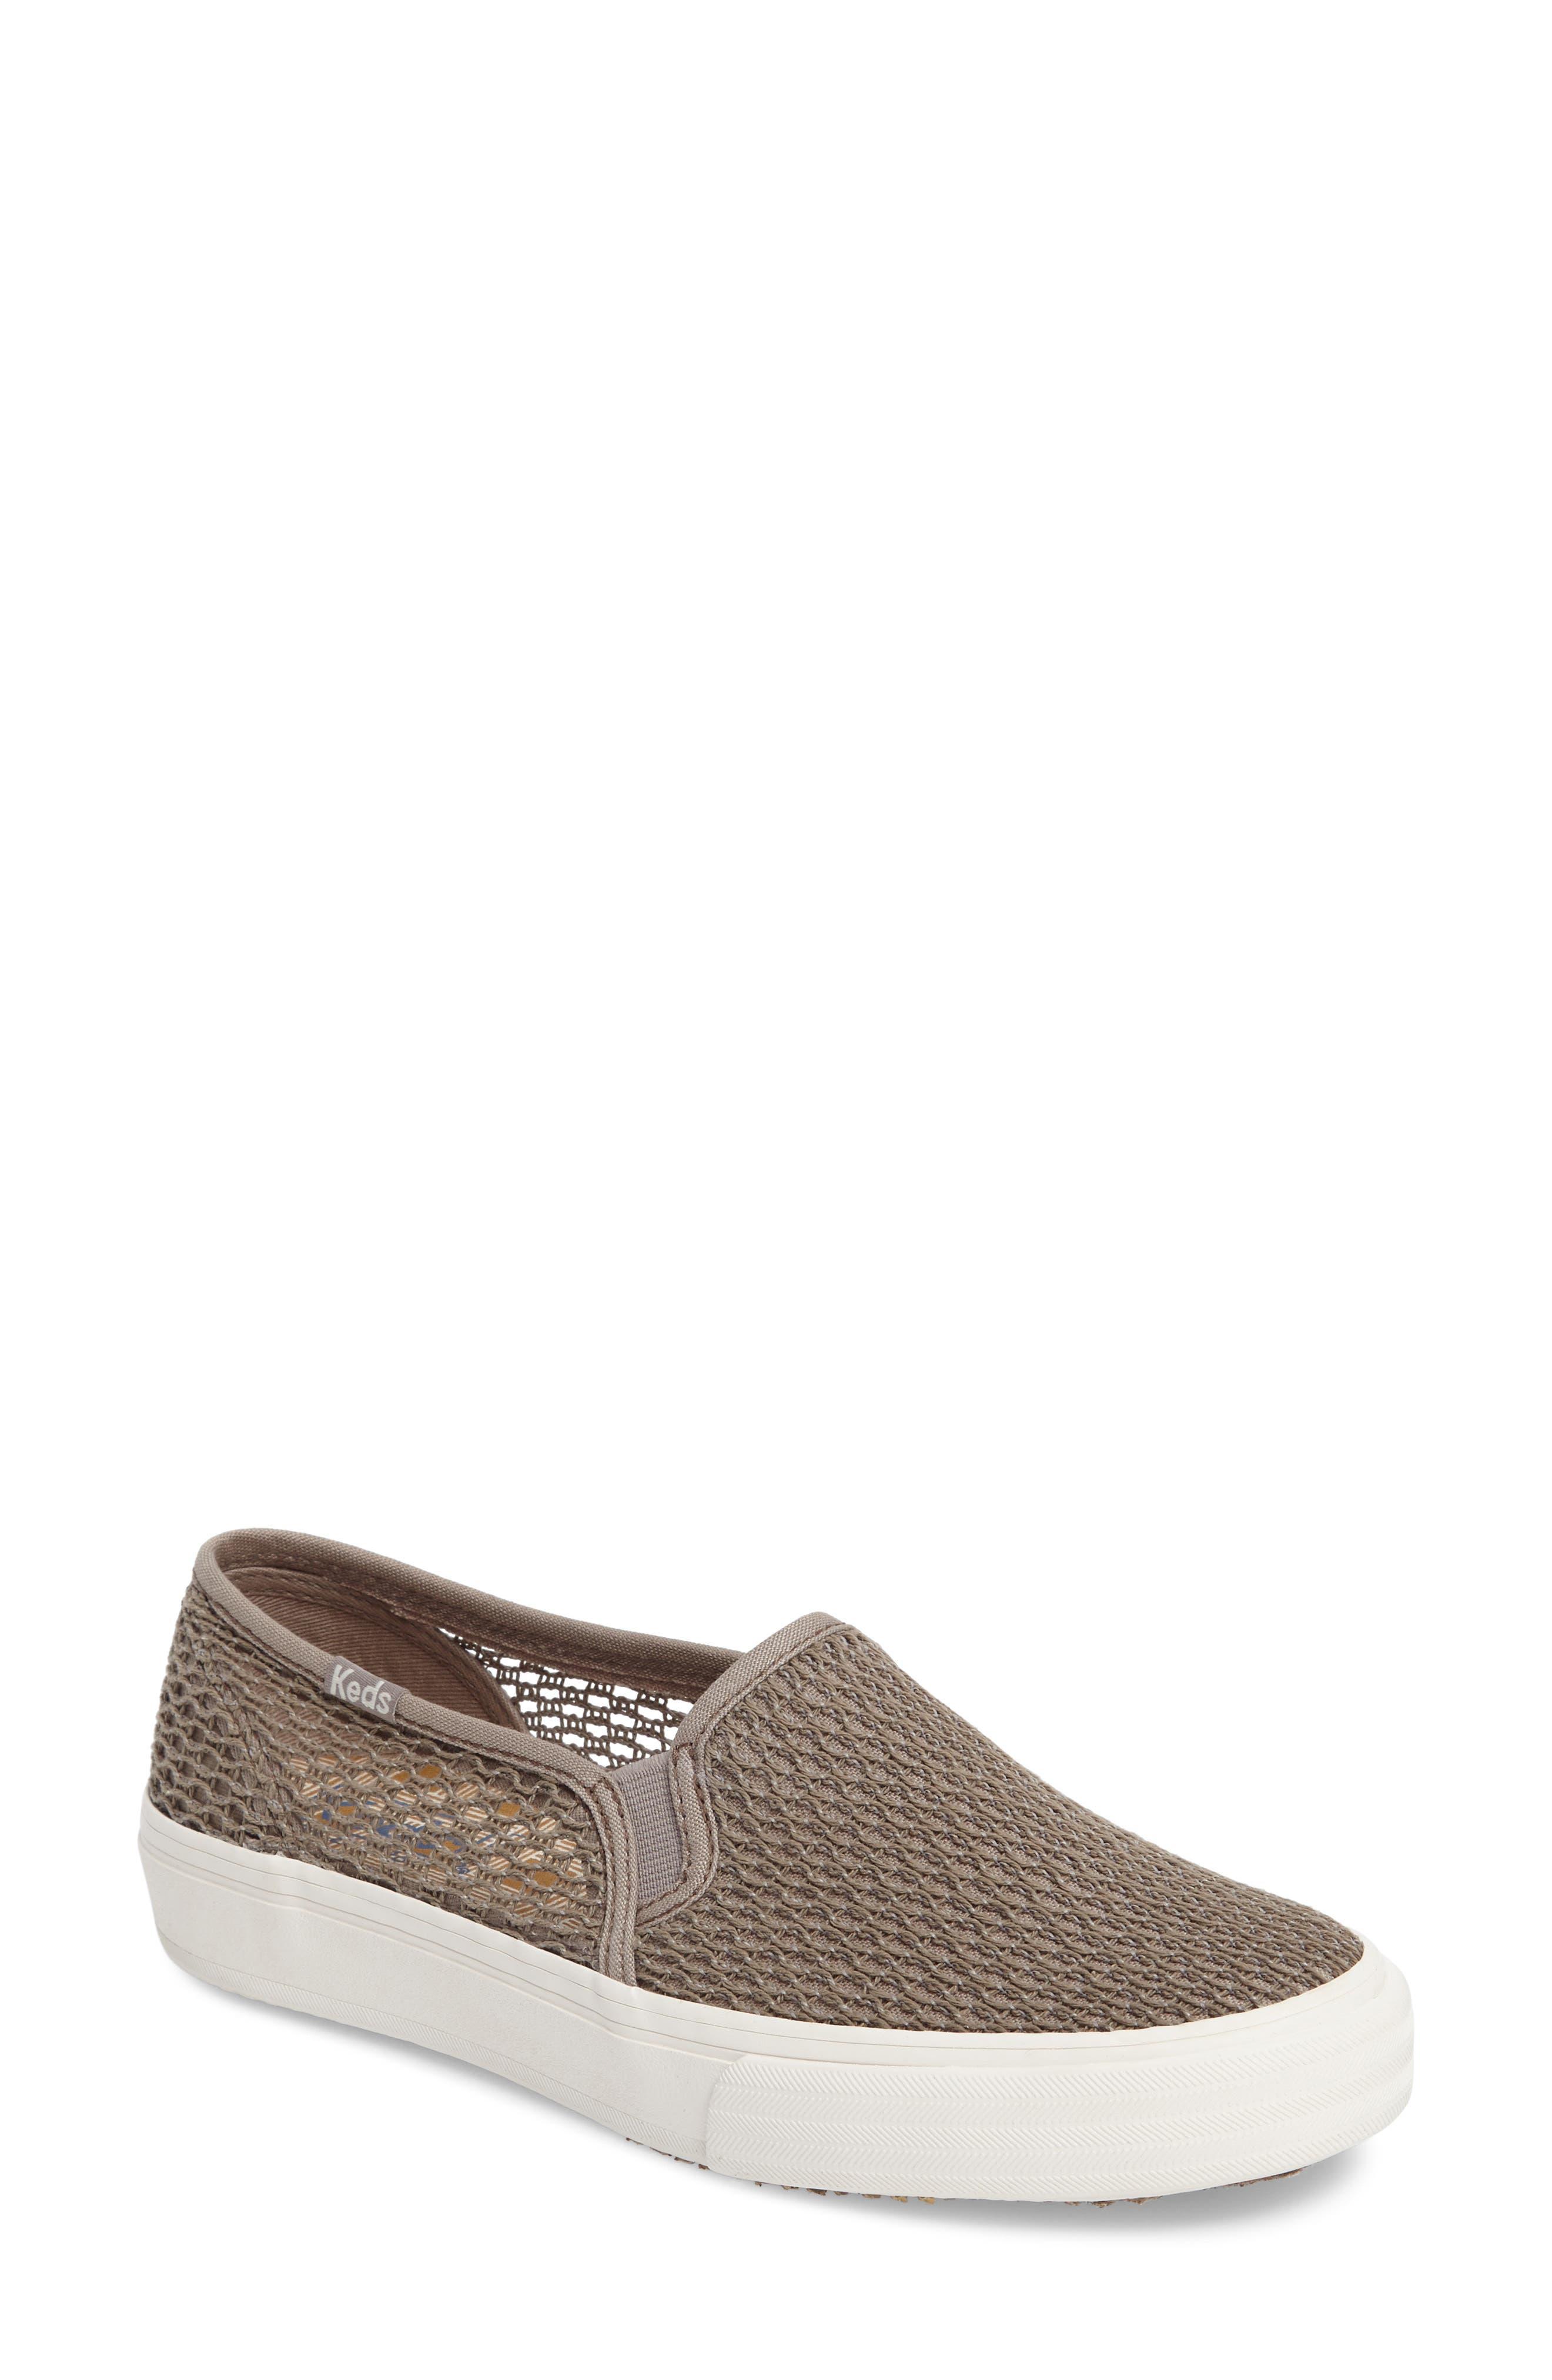 Double Decker Crochet Slip-On Sneaker,                         Main,                         color, 250